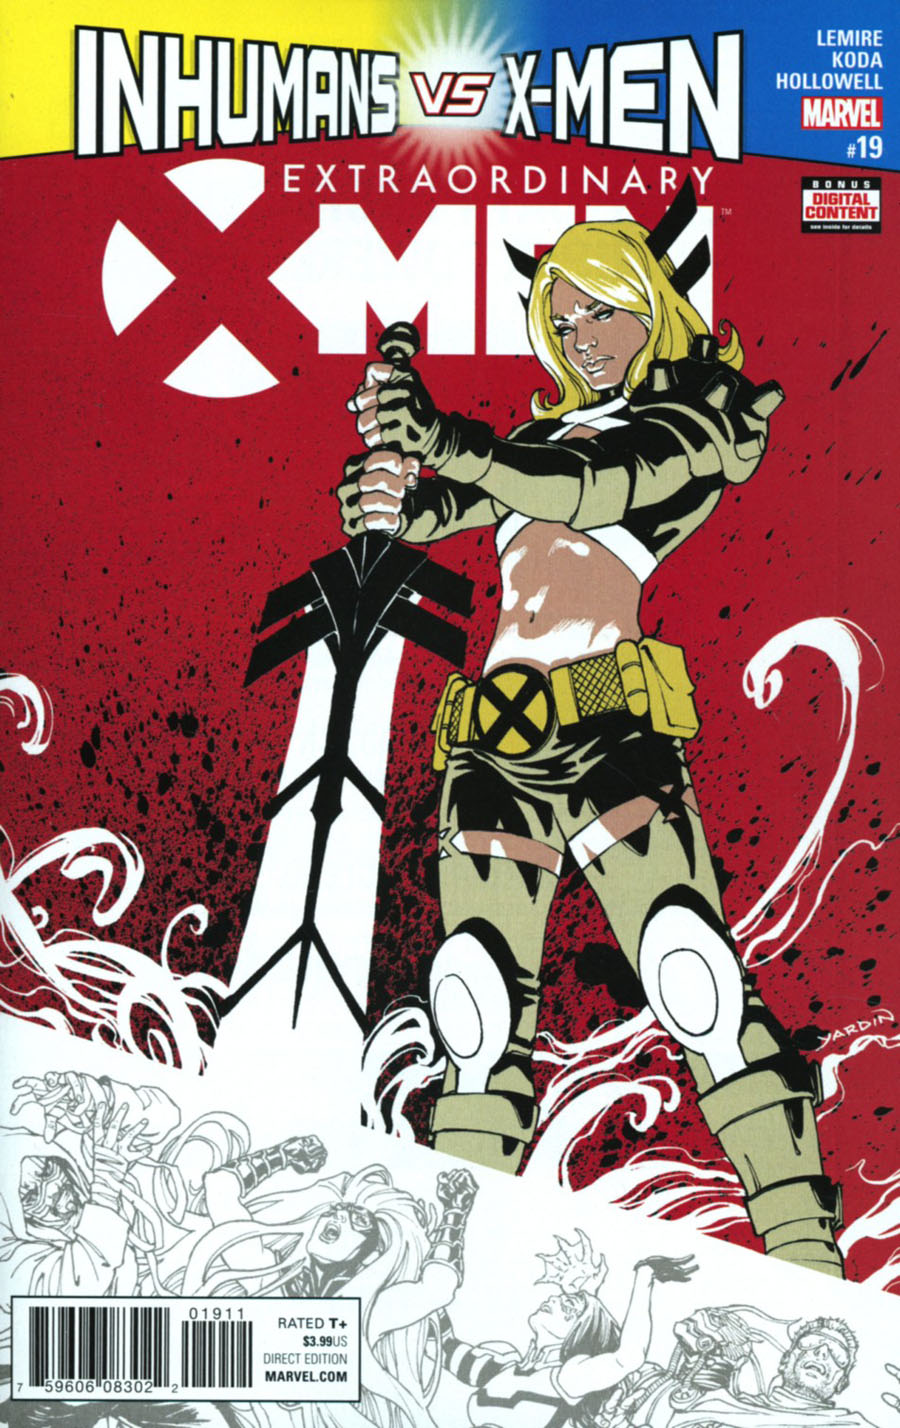 Extraordinary X-Men #19 Cover A Regular David Yardin Cover (Inhumans vs X-Men Tie-In)